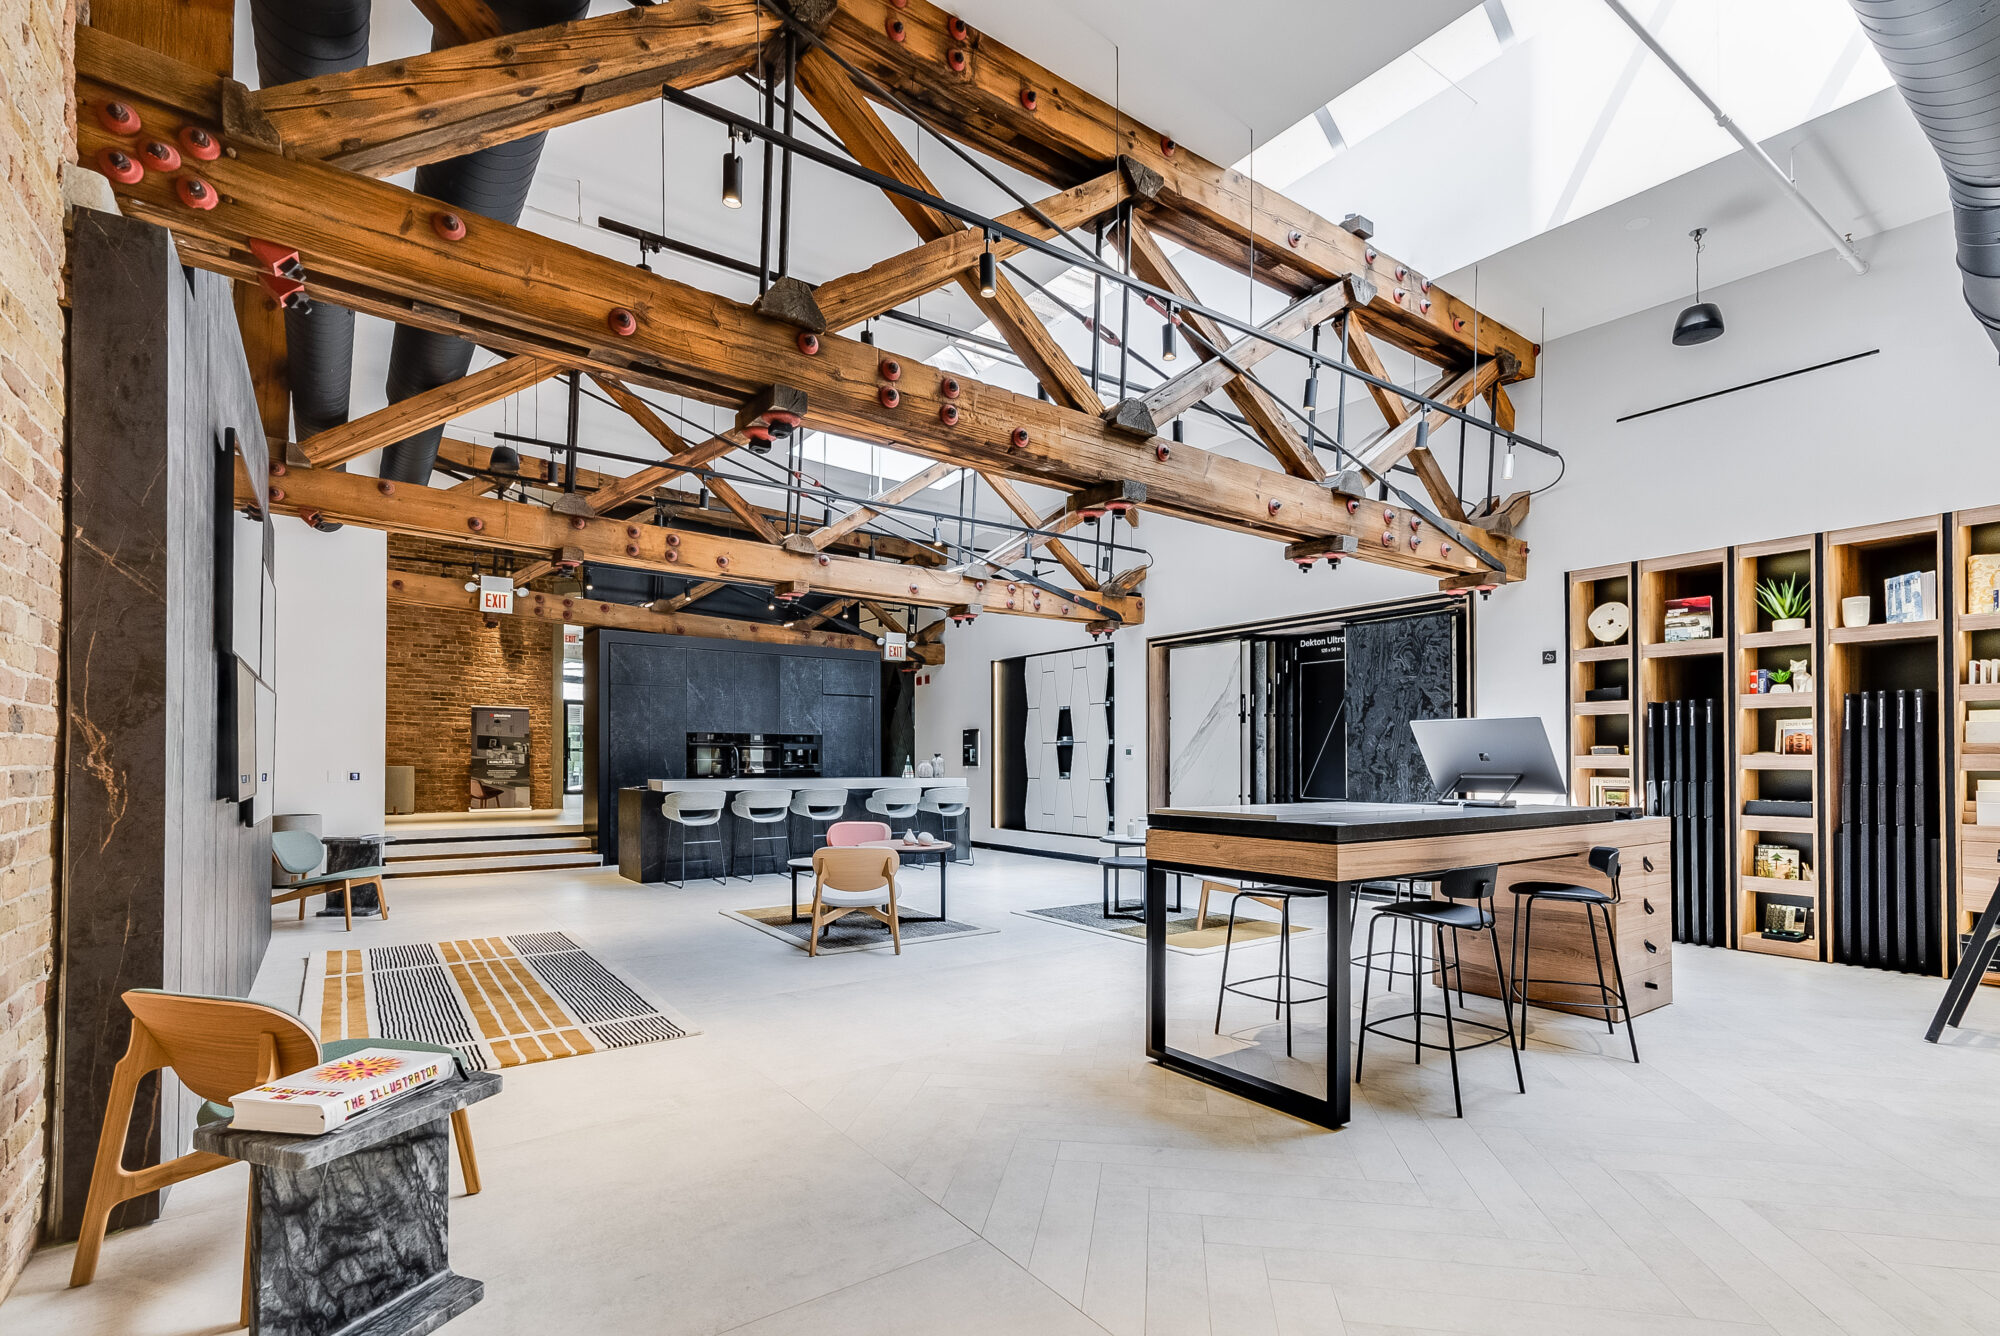 cosentino city showroom interiors with beams